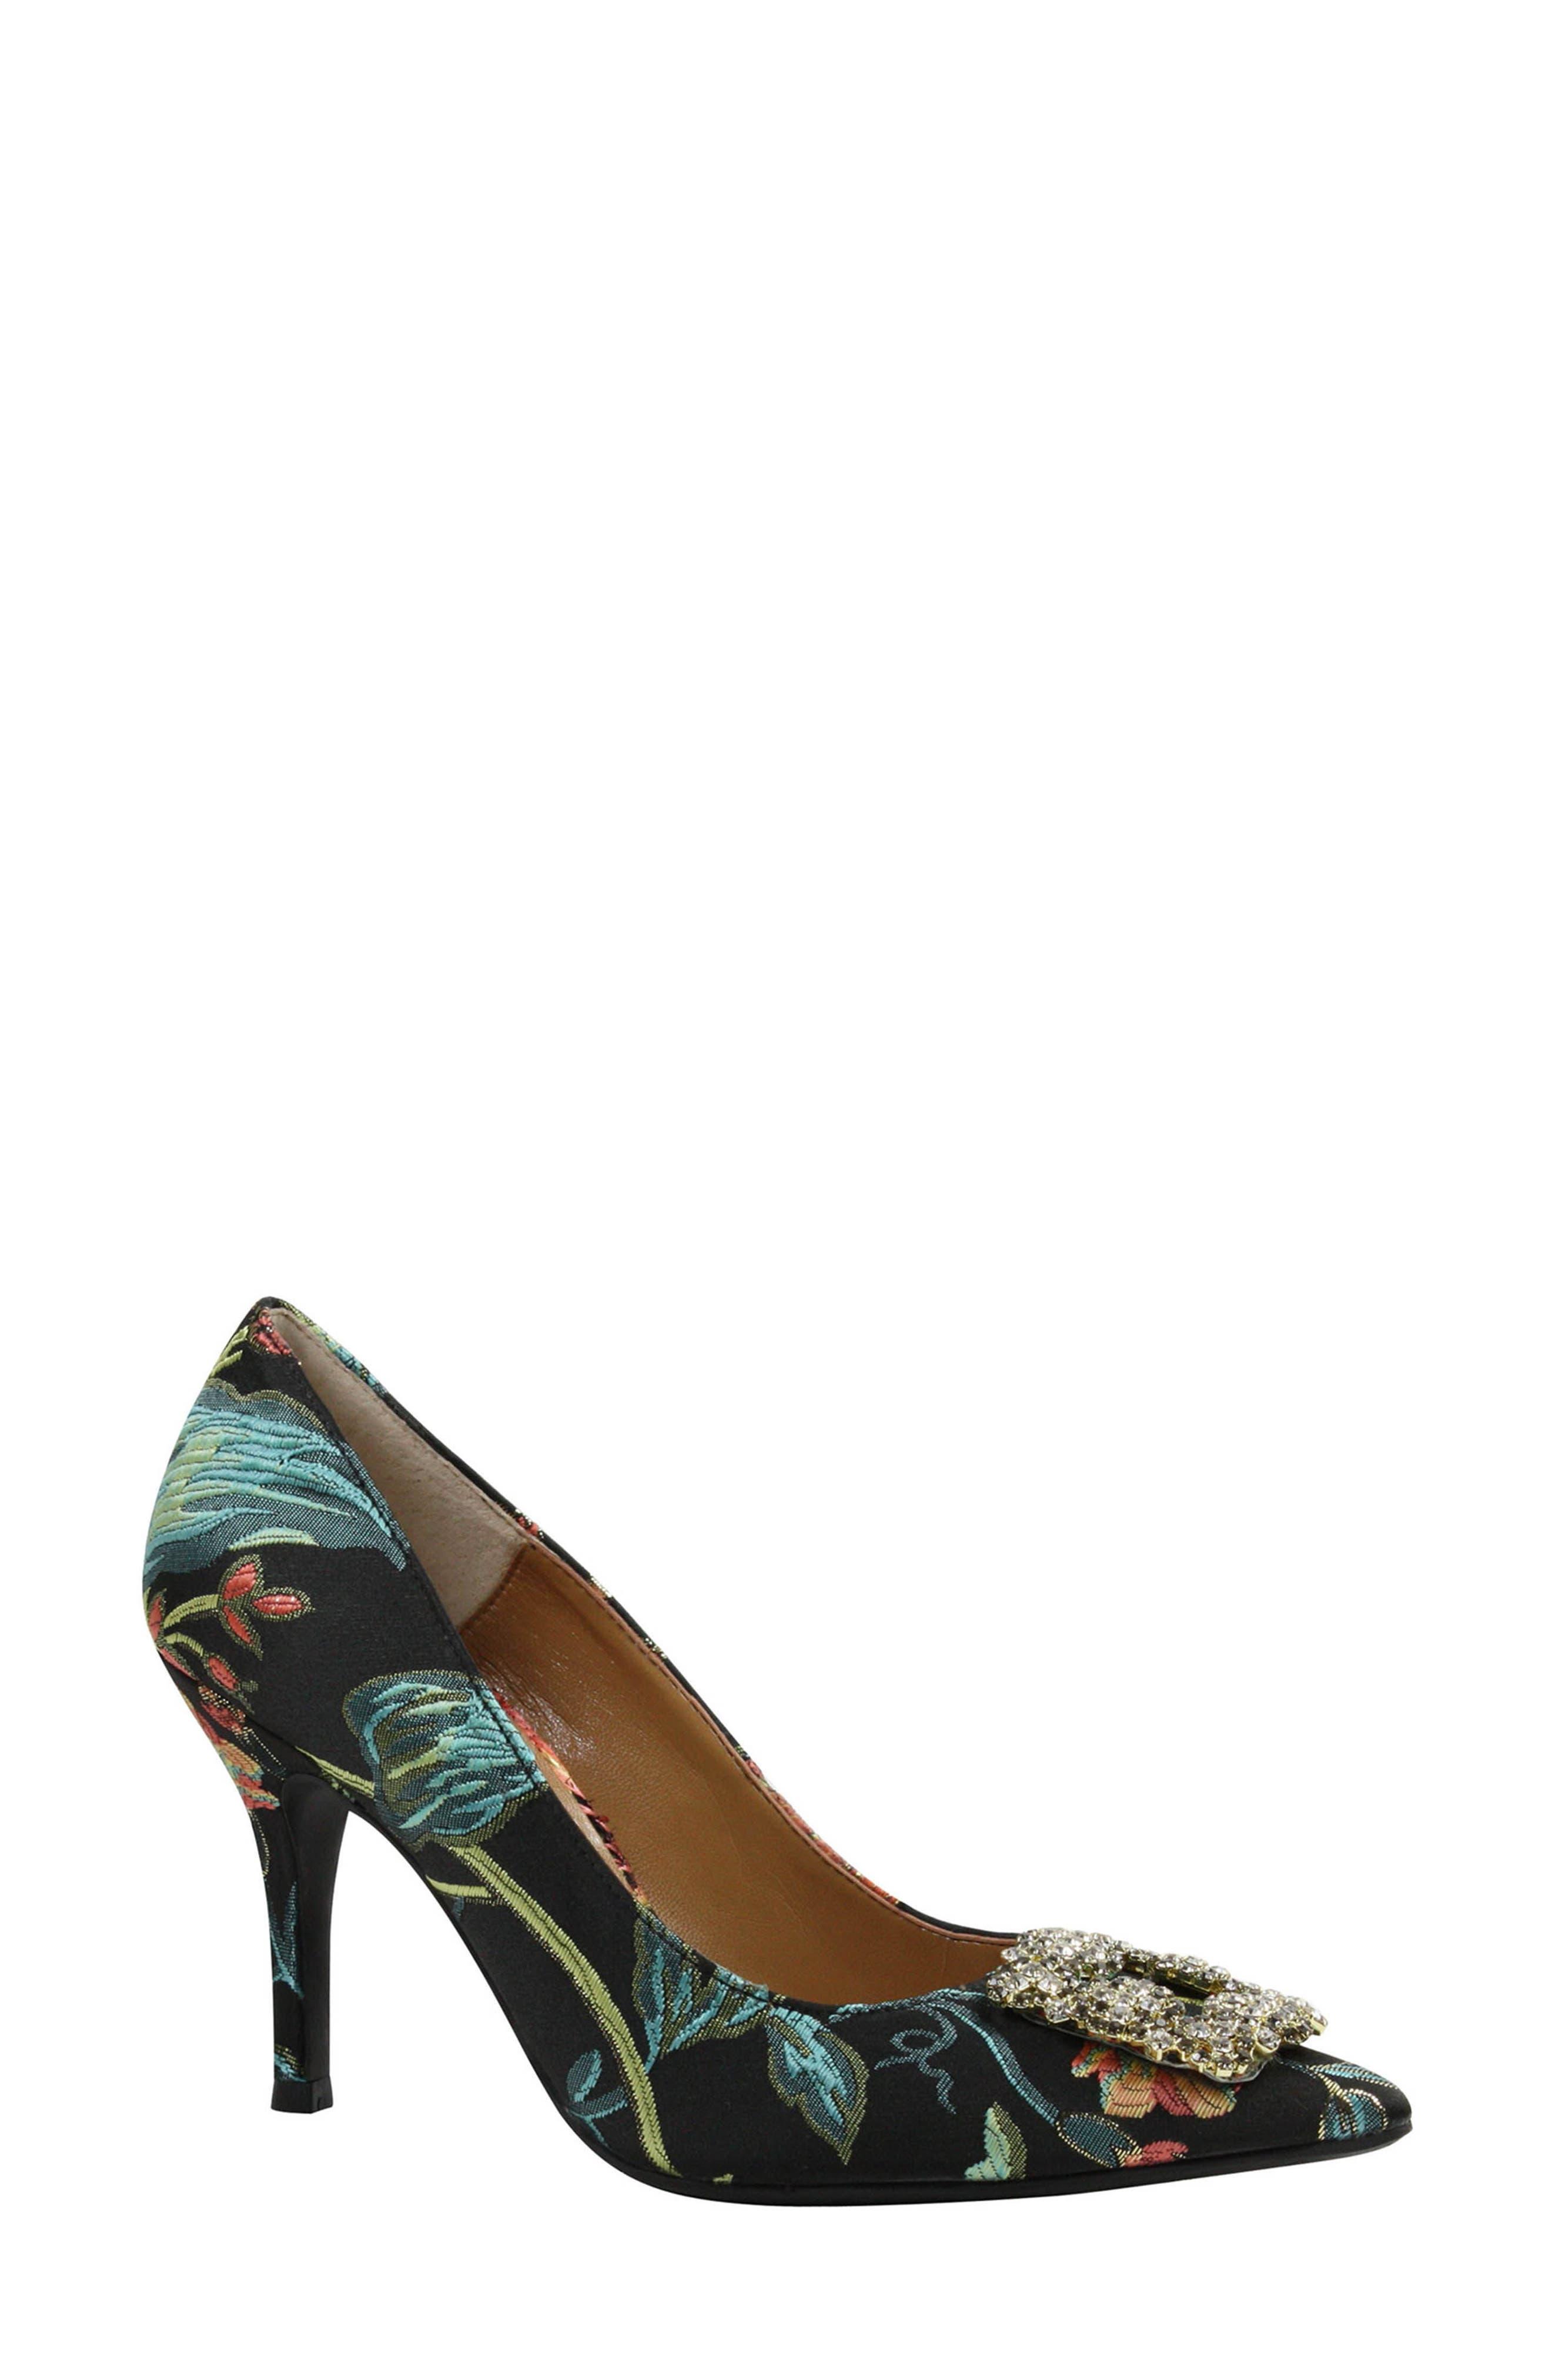 J.Reneé Bilboa Pointy Toe Pump,                         Main,                         color, Black/ Teal/ Coral Fabric